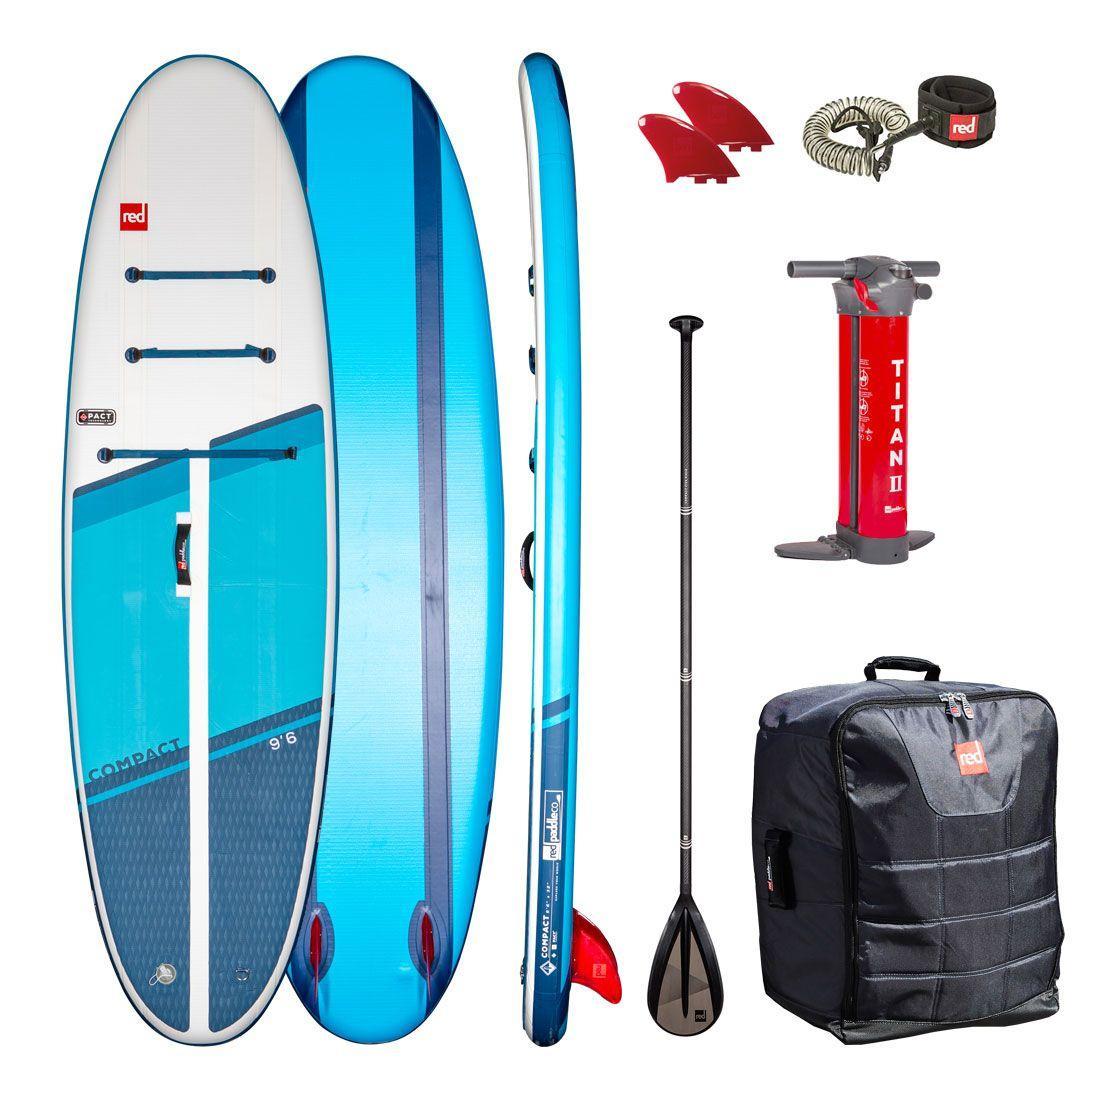 "Сапборд Red Paddle Co Compact 9'6"" 2021 - надувна дошка для САП серфінгу, sup board"